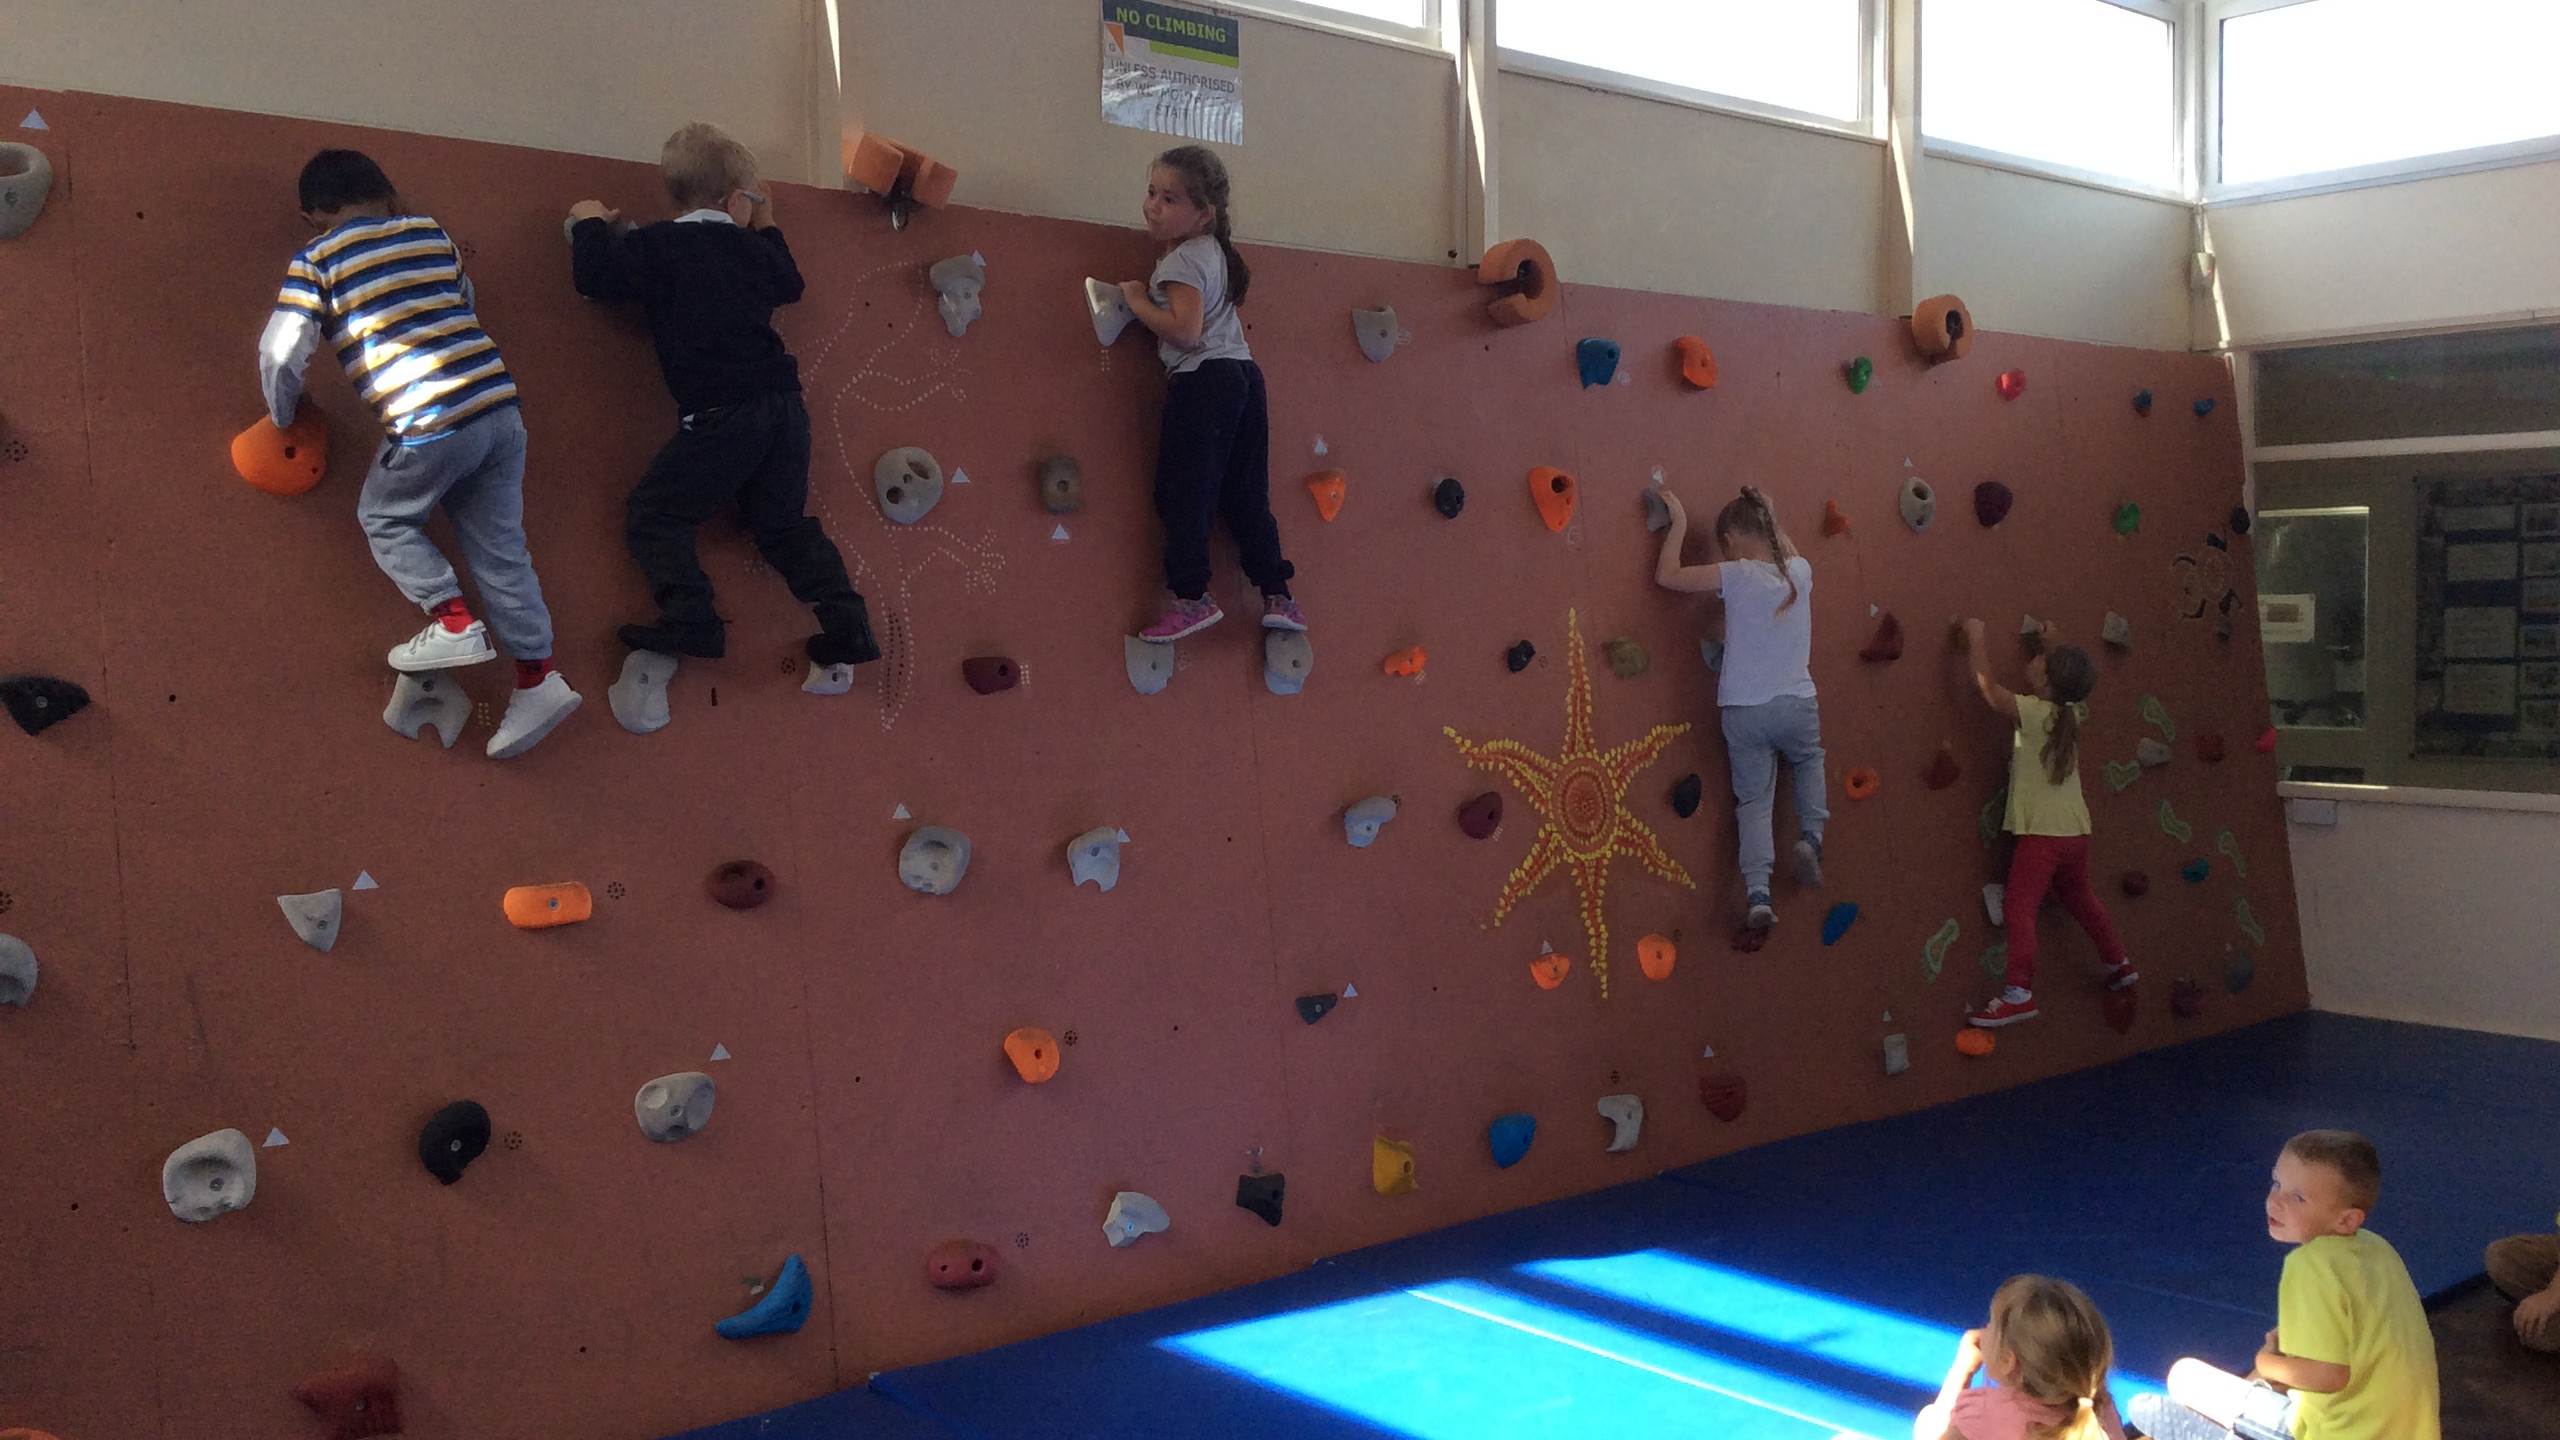 Conifers-School-Outdoor-Education